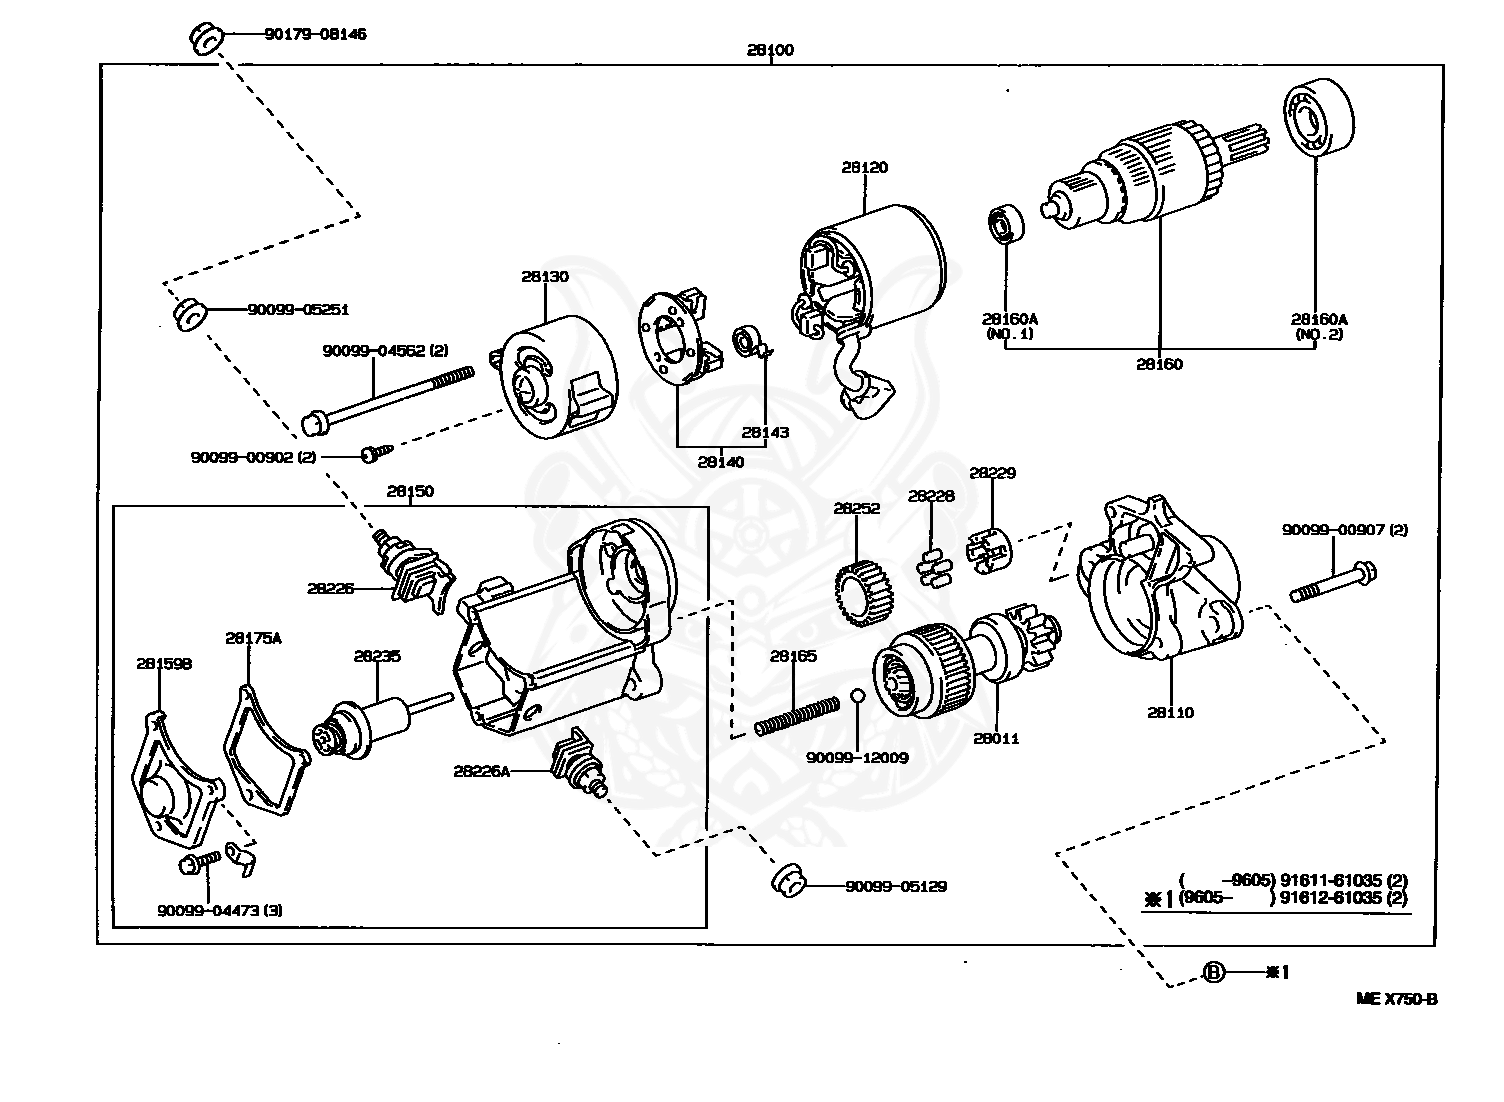 1995 Toyota Camry Shop Service Repair Manual Book Engine Drivetrain OEM